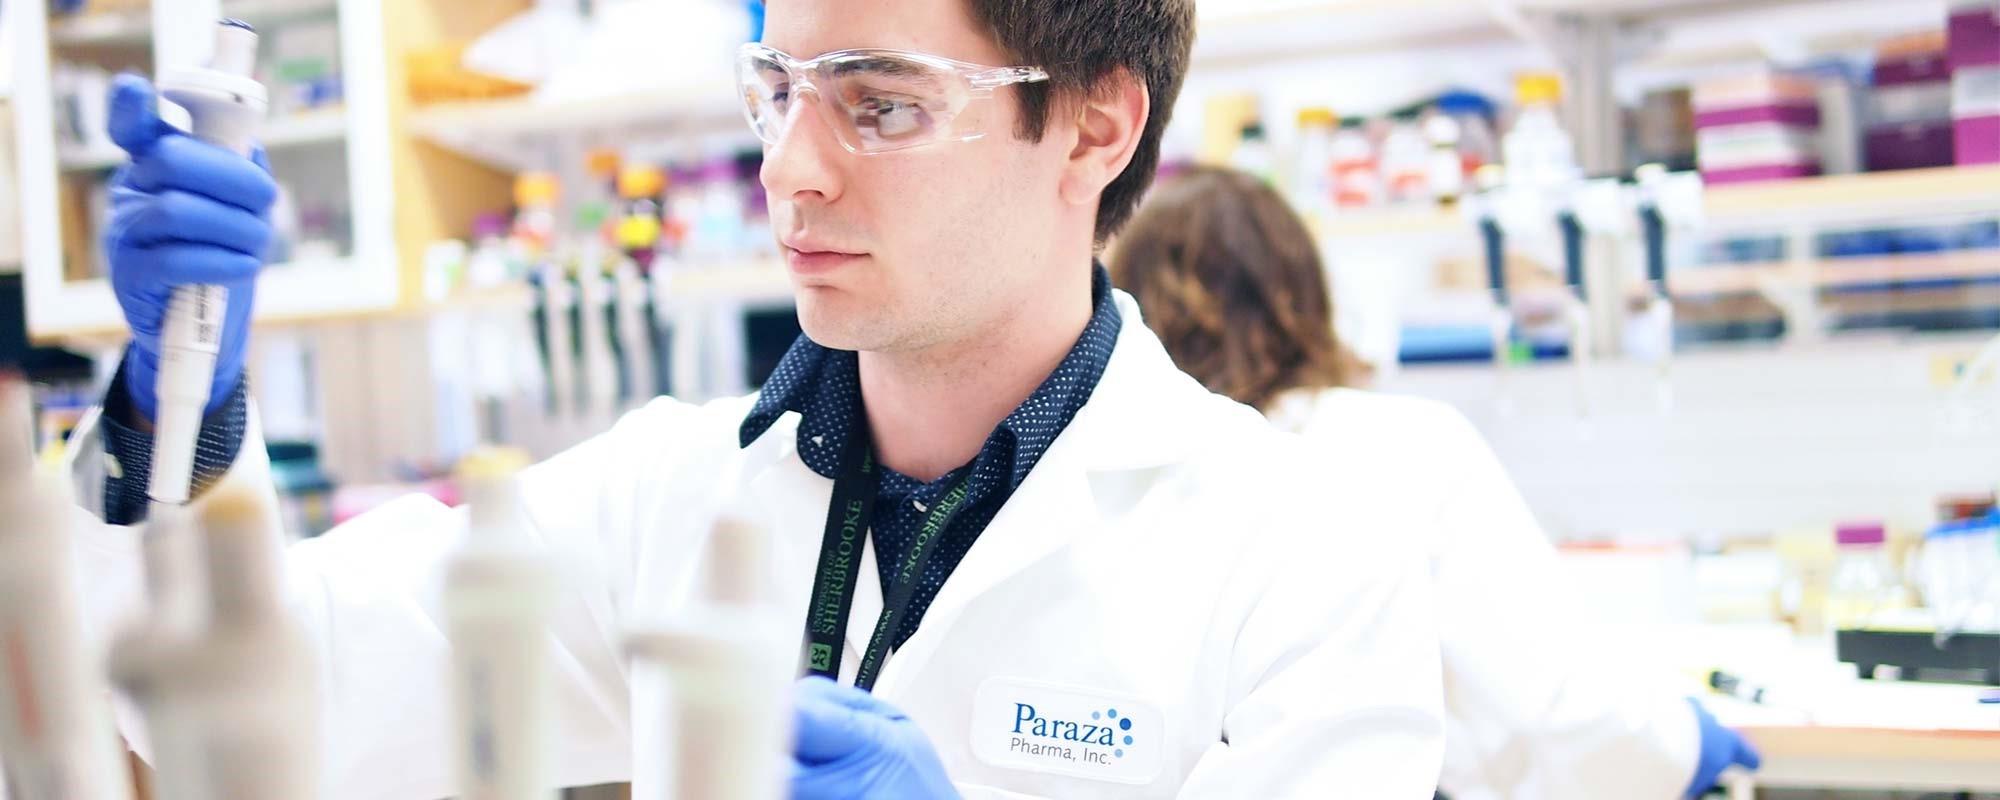 paraza-pharma image